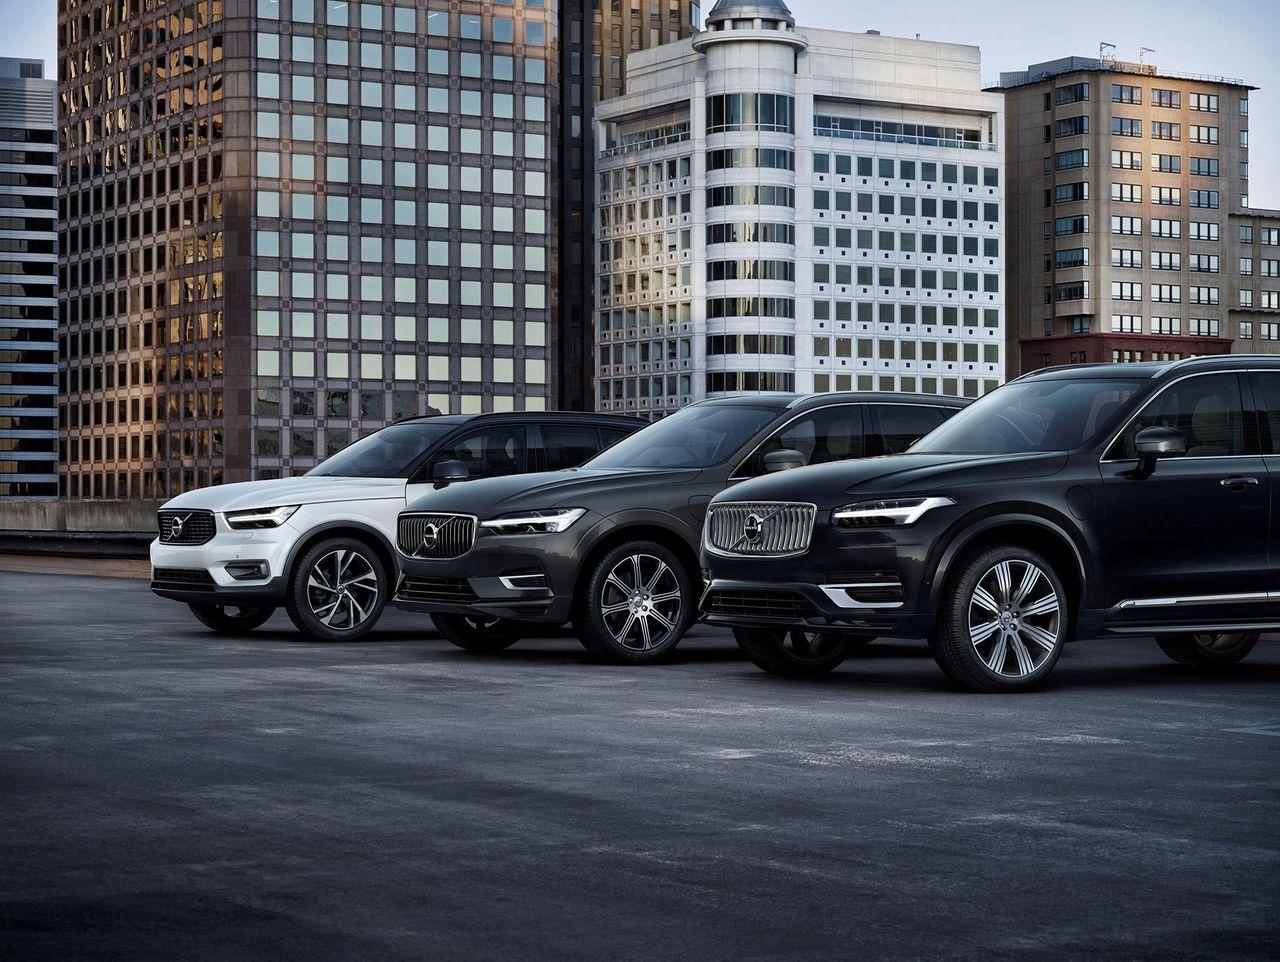 Ny strategi kan göra Volvo-bilar dyrare i Sverige